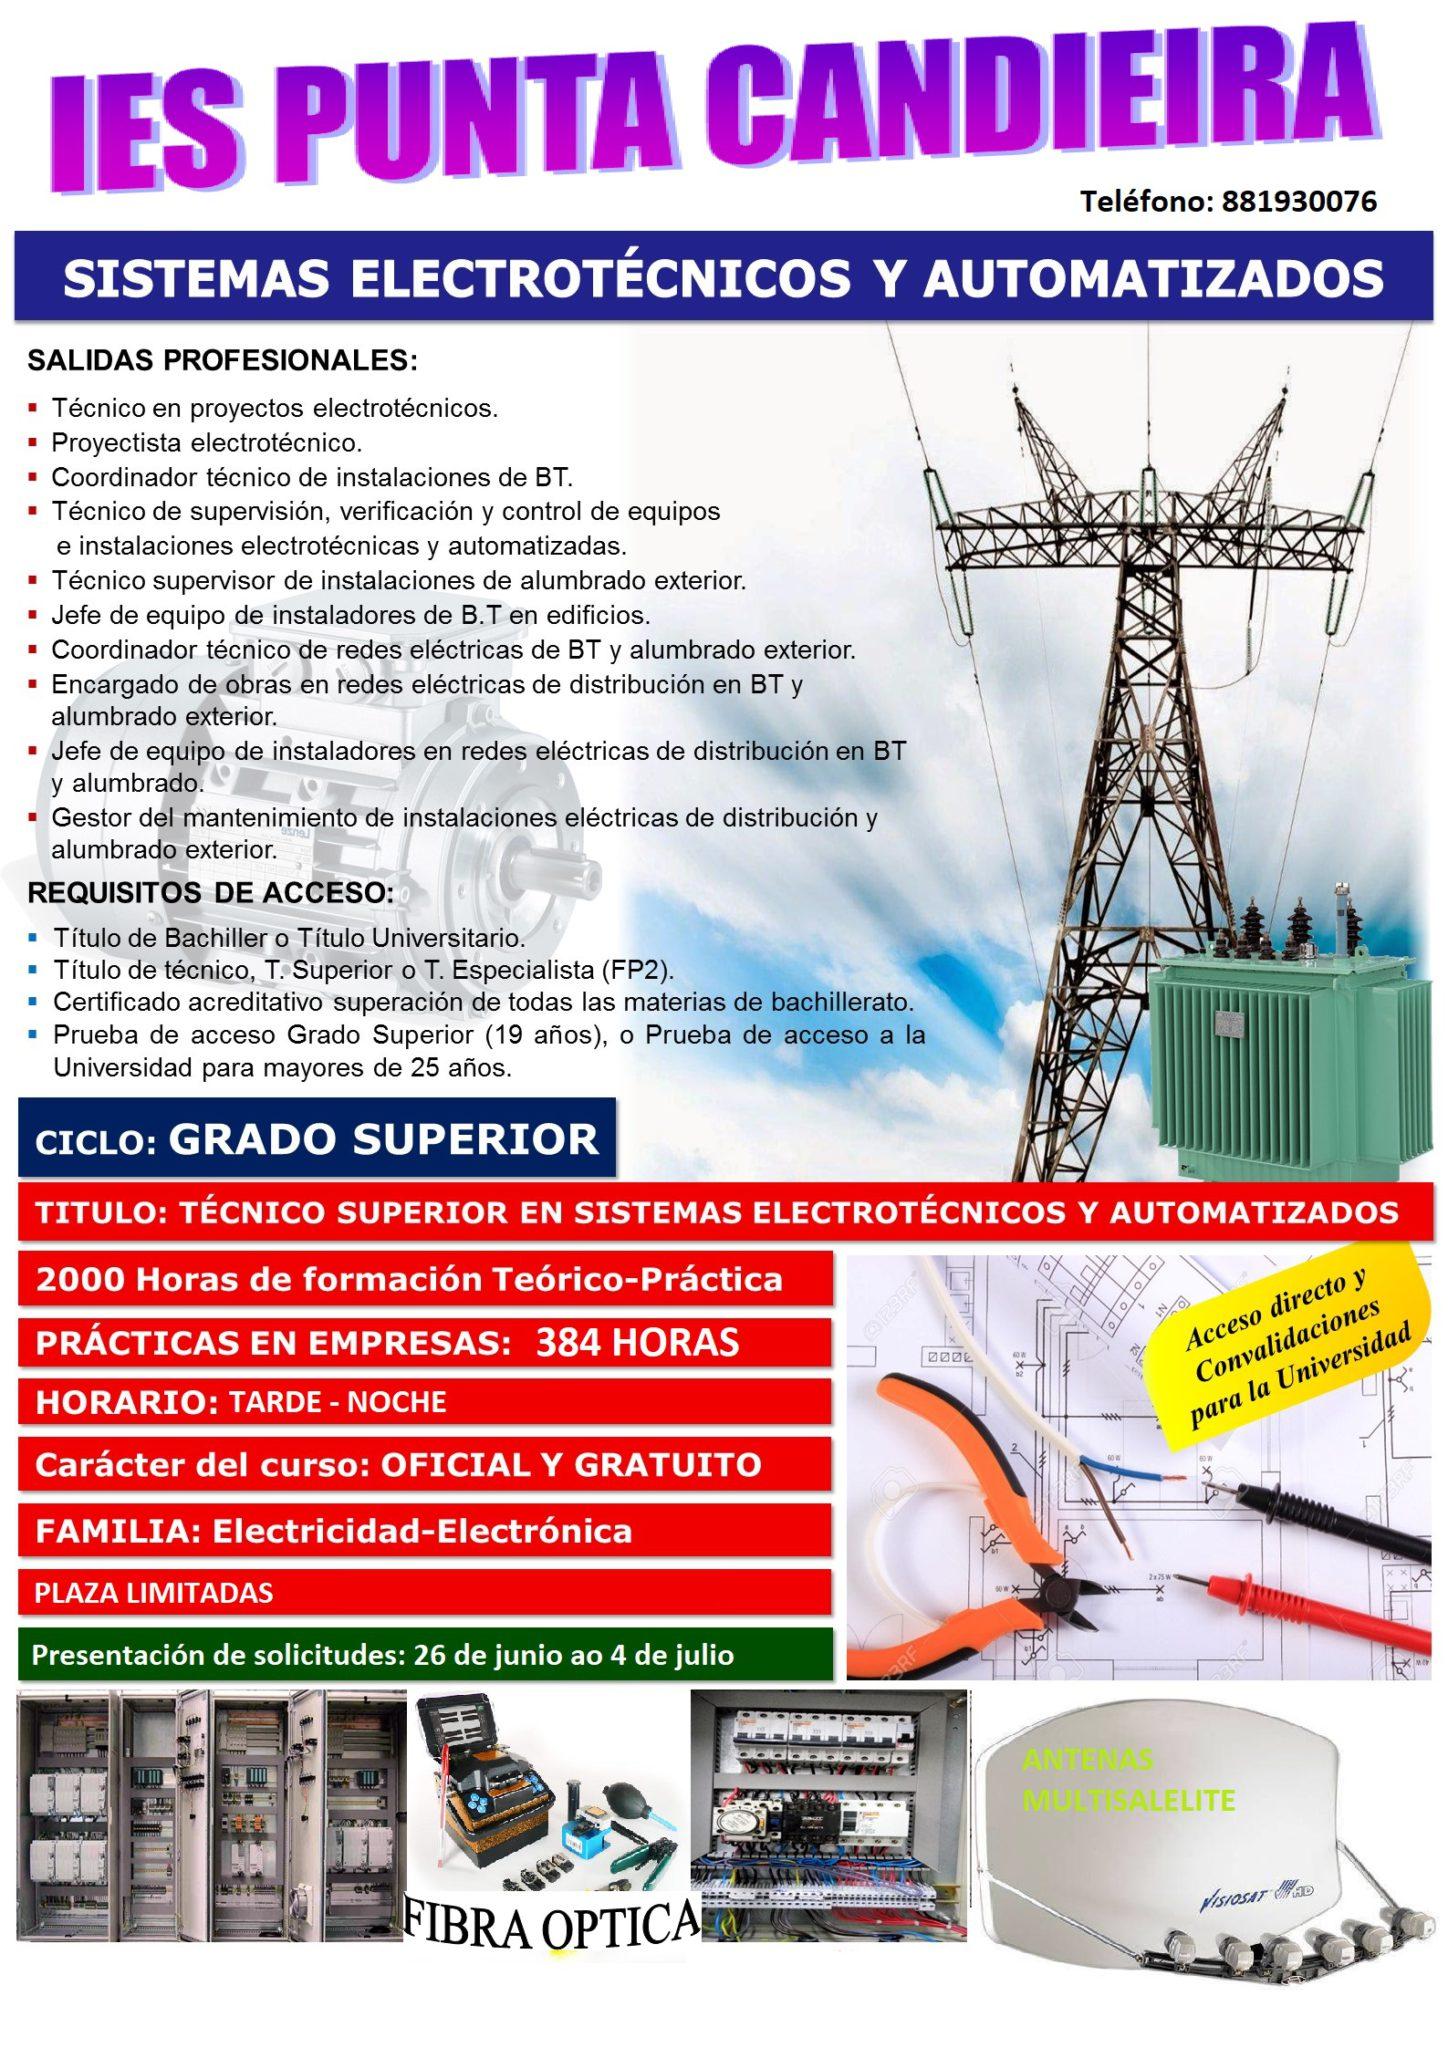 Aberto o prazo de matrícula dos Ciclo Medio e Superior de Electricidade e da FP Básica no IES Punta Candieira de Cedeira